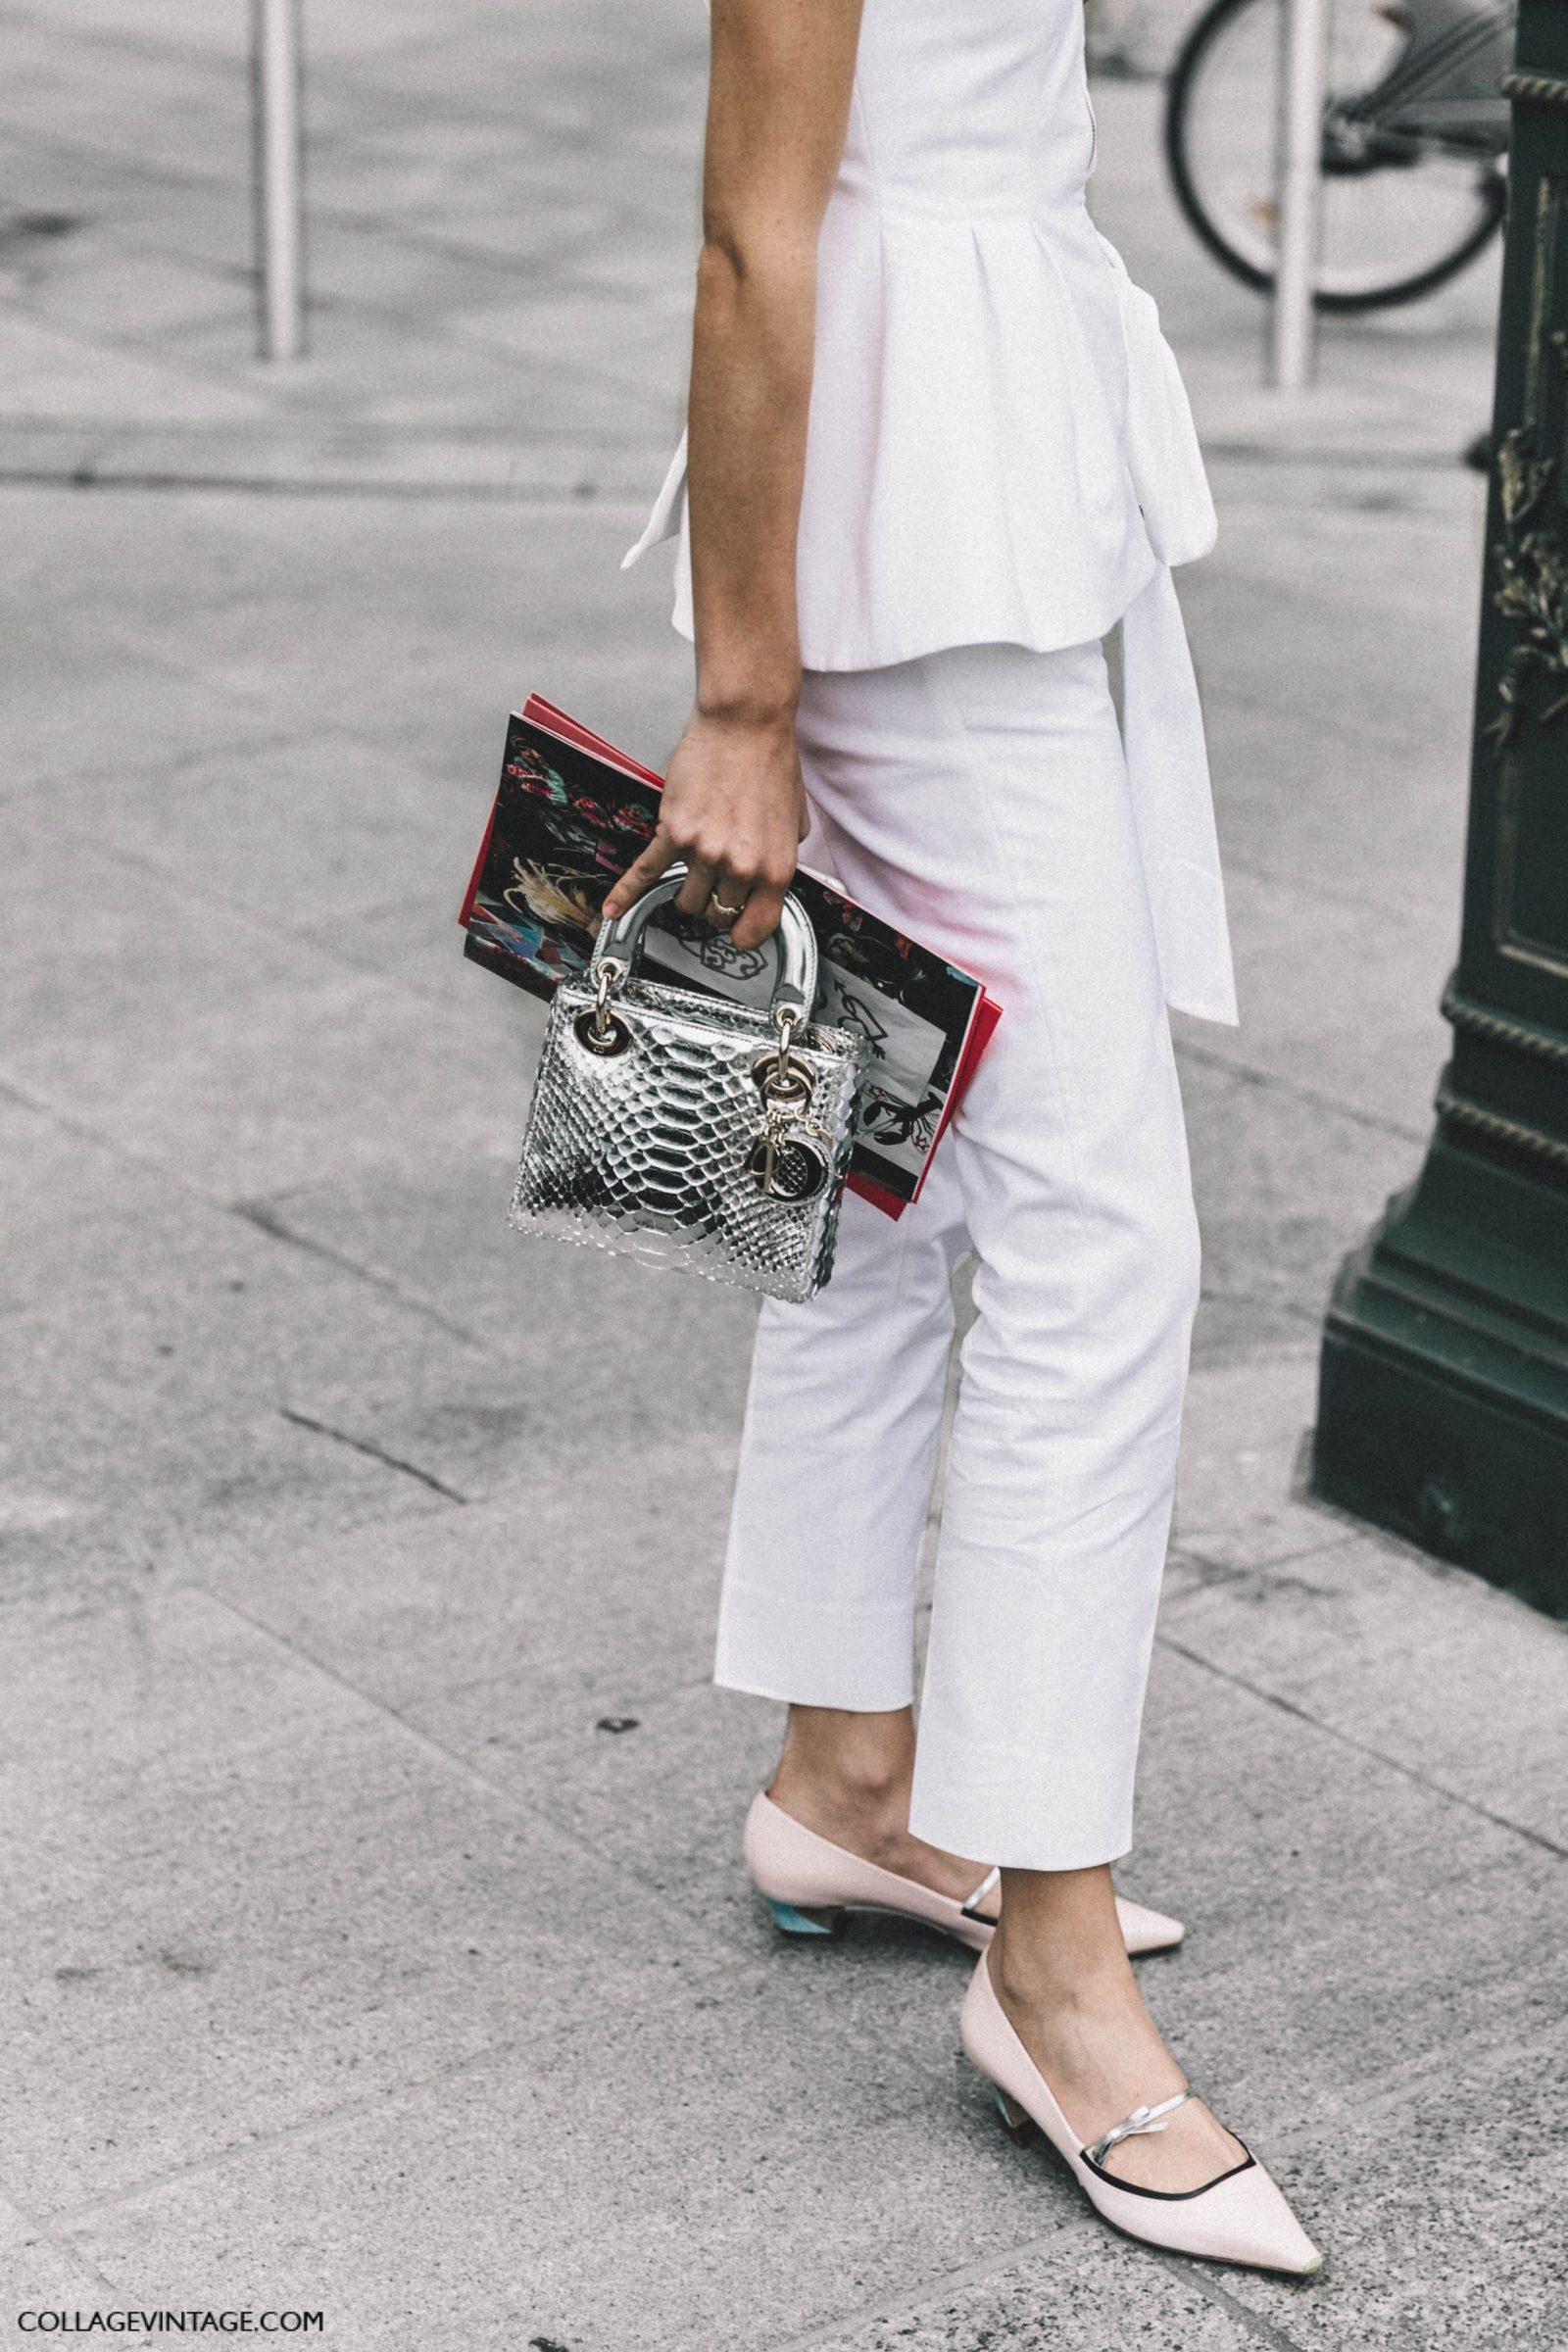 Paris_Couture_Fashion_Week-Collage_Vintage-Street_Style-20